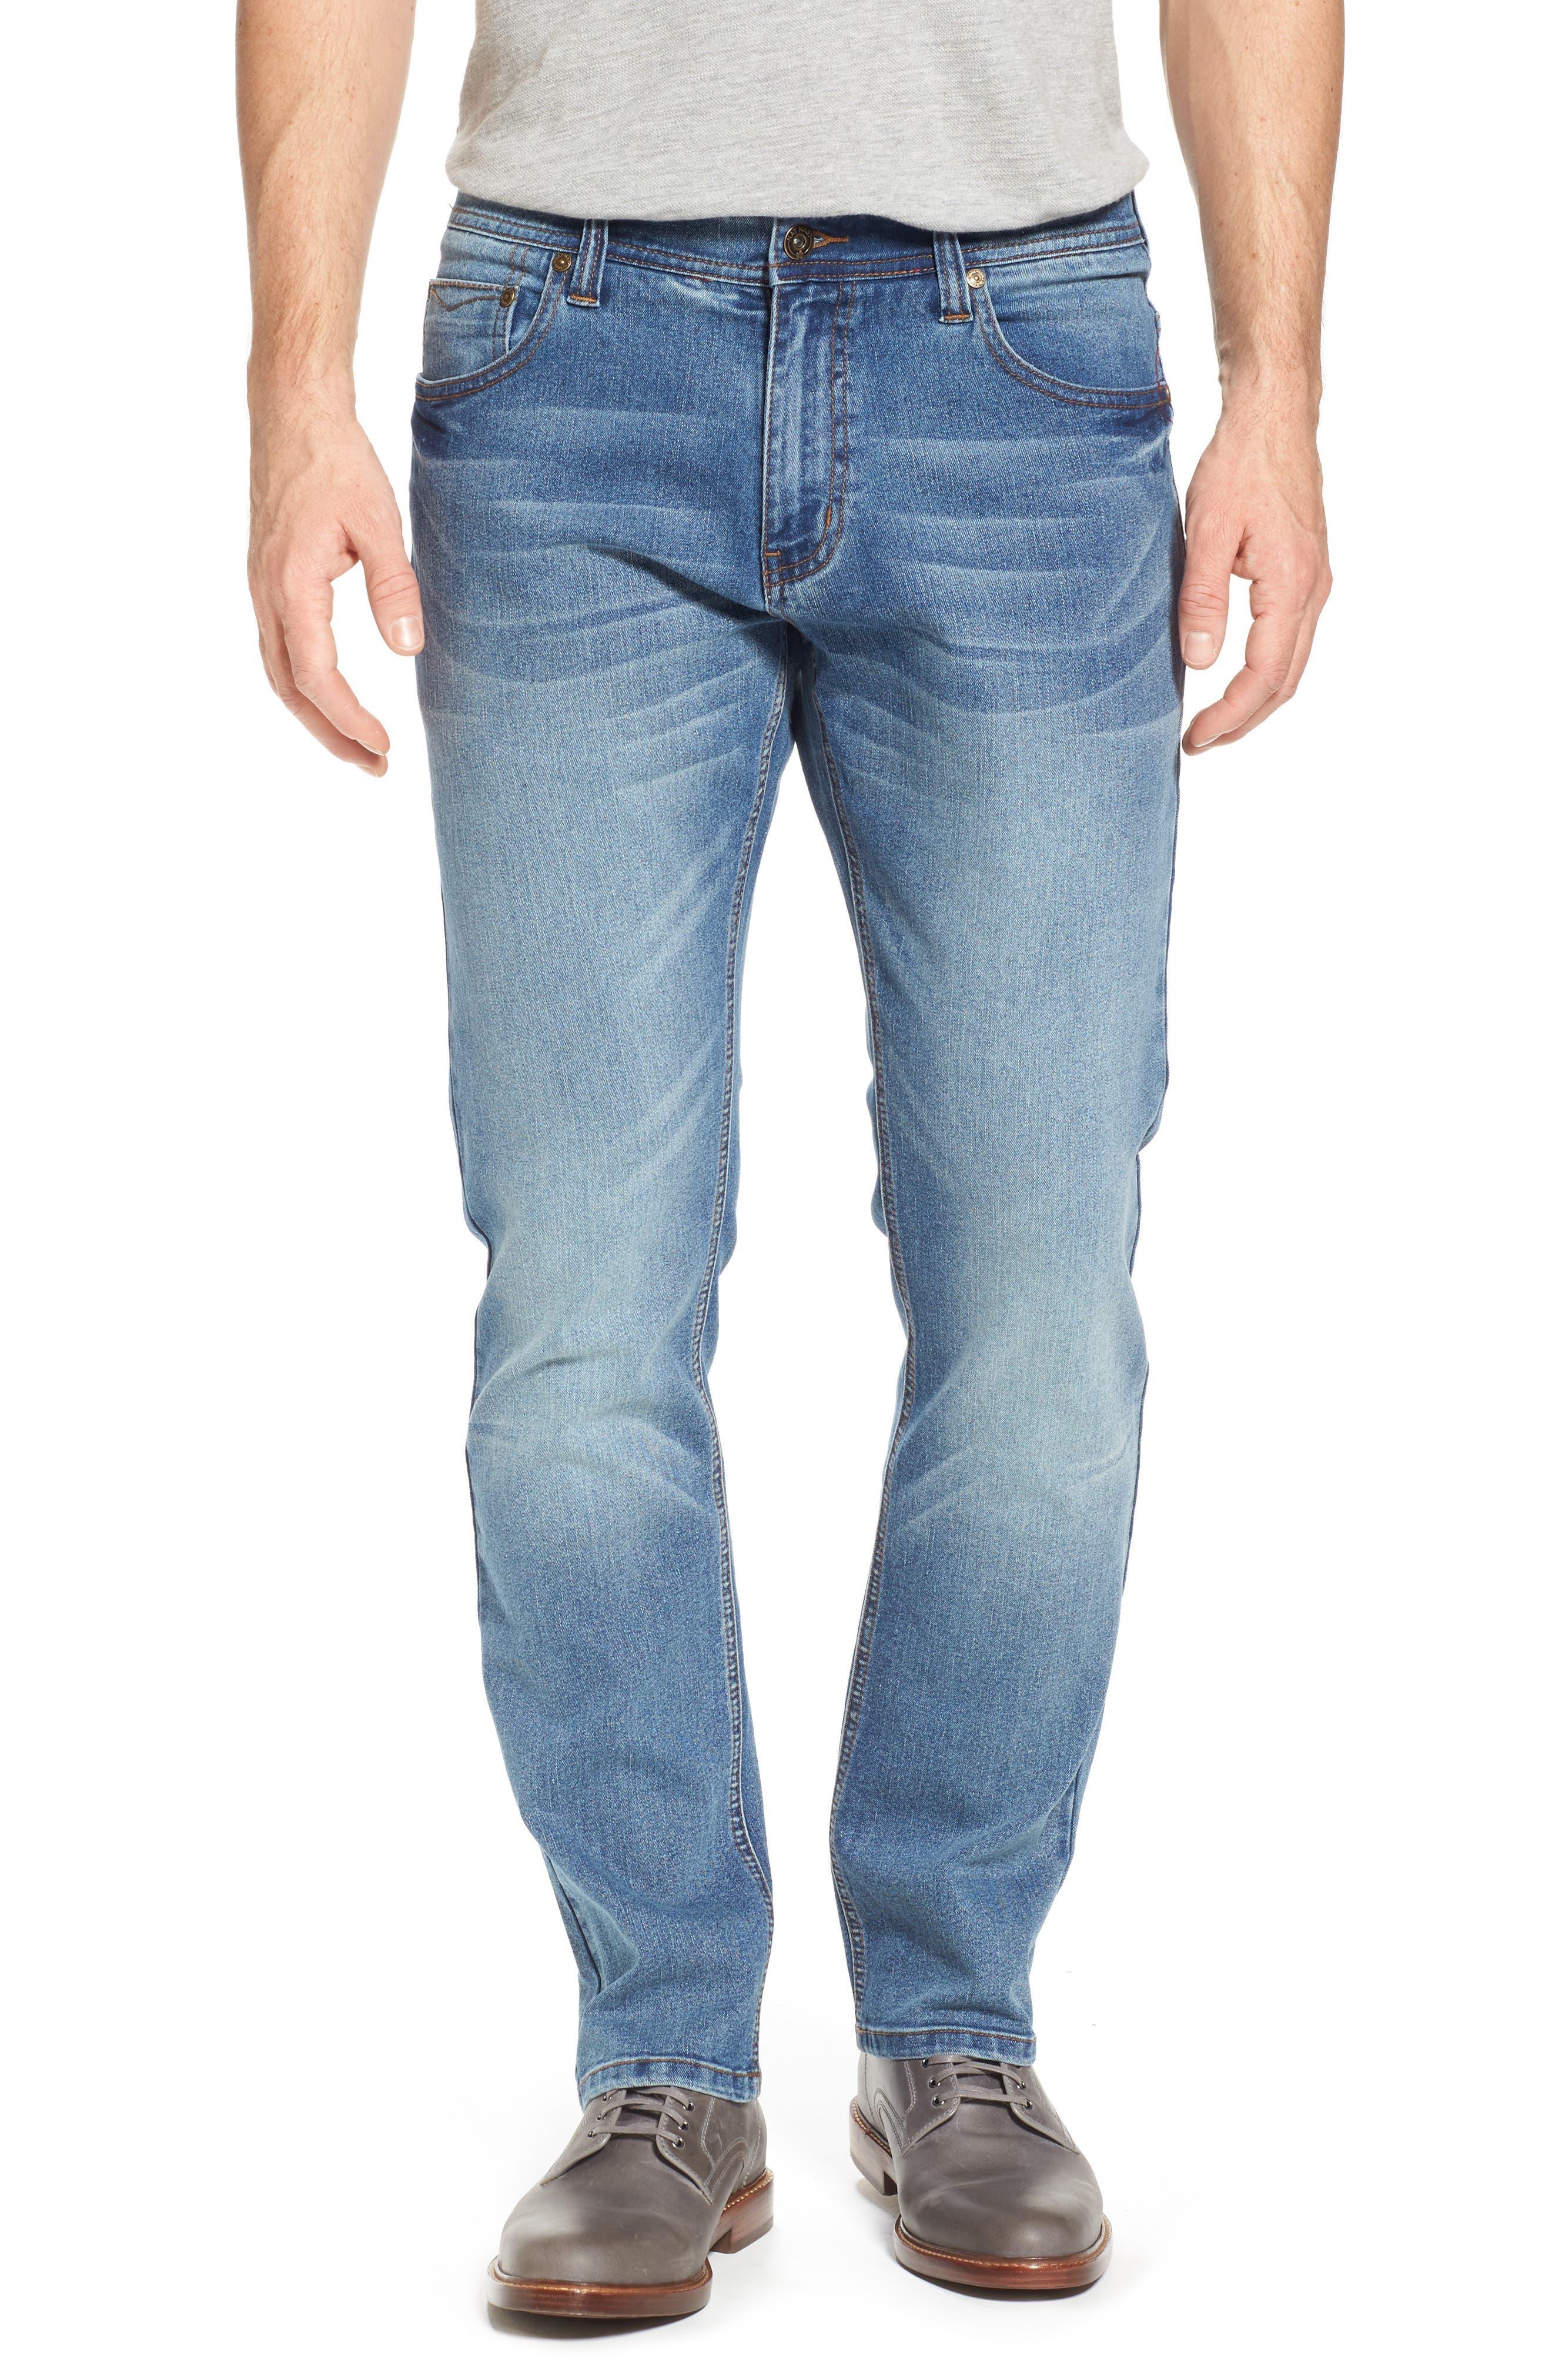 Maverick Stretch Slim Fit Jeans,                         Main,                         color, Beach Wash